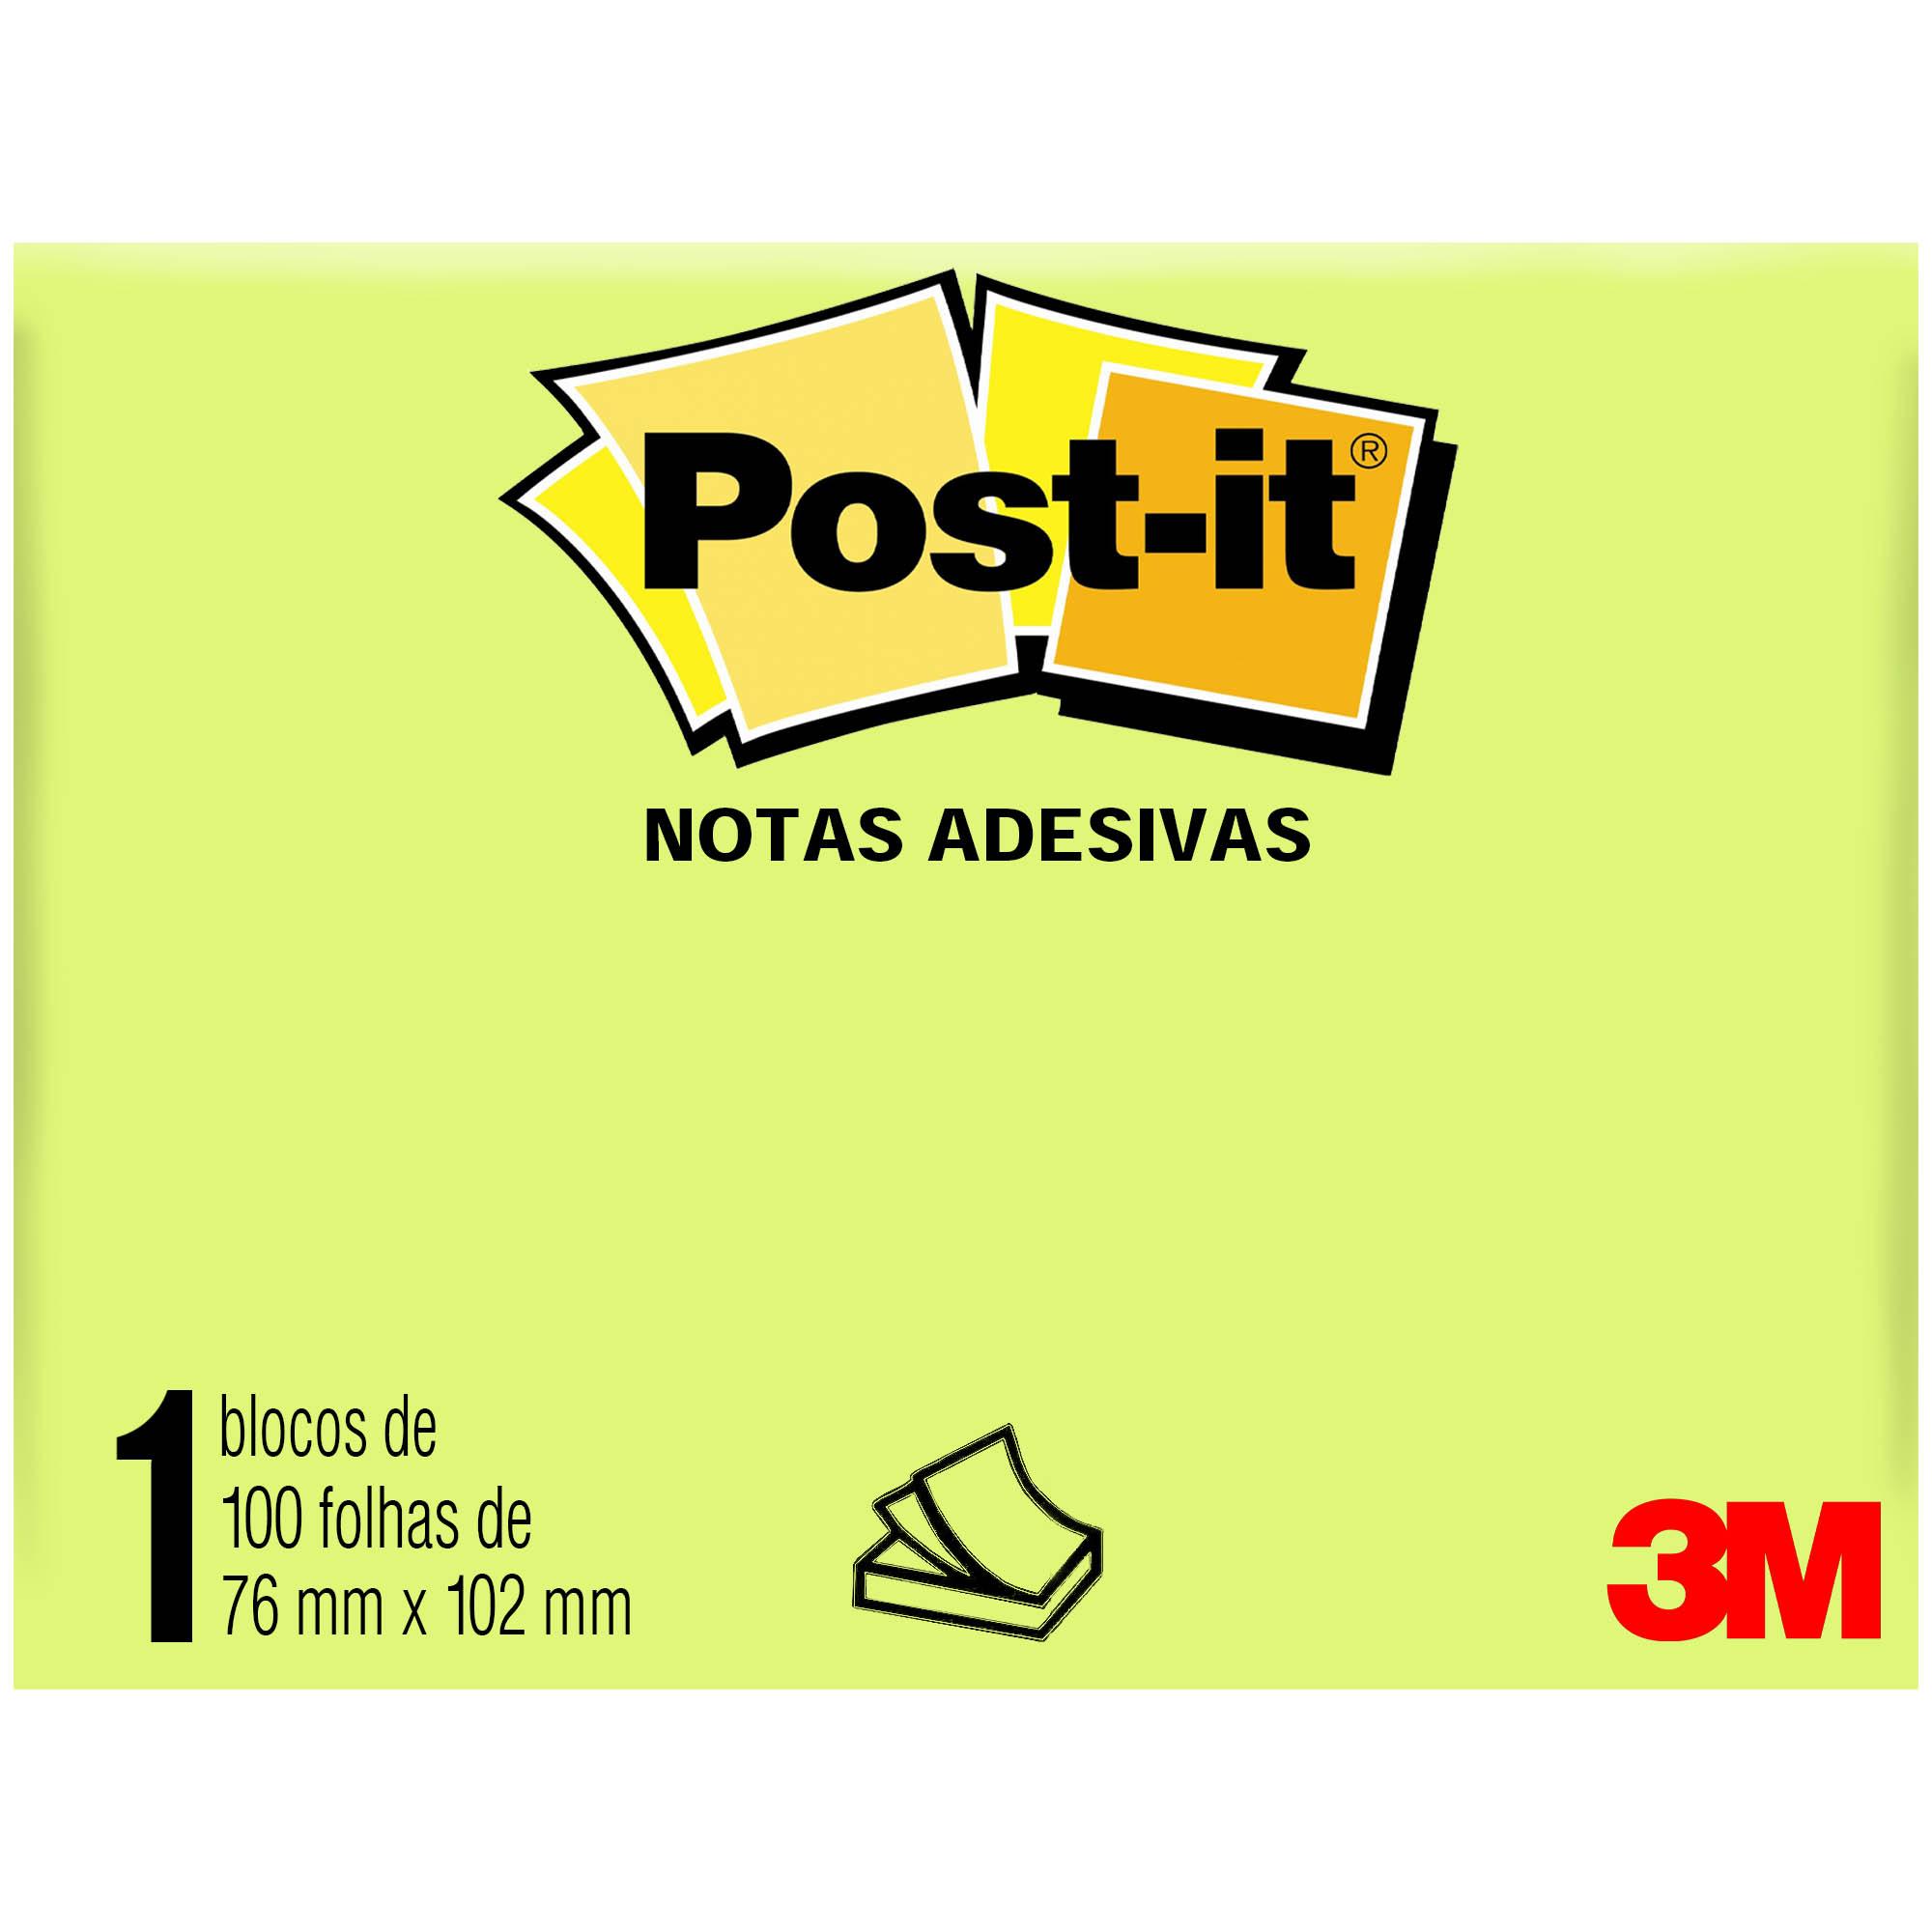 Bloco Autoadesivo Post-It 657 GD 100f 76MMX102MM HT Cor Amarelo HB004088132 - 3M